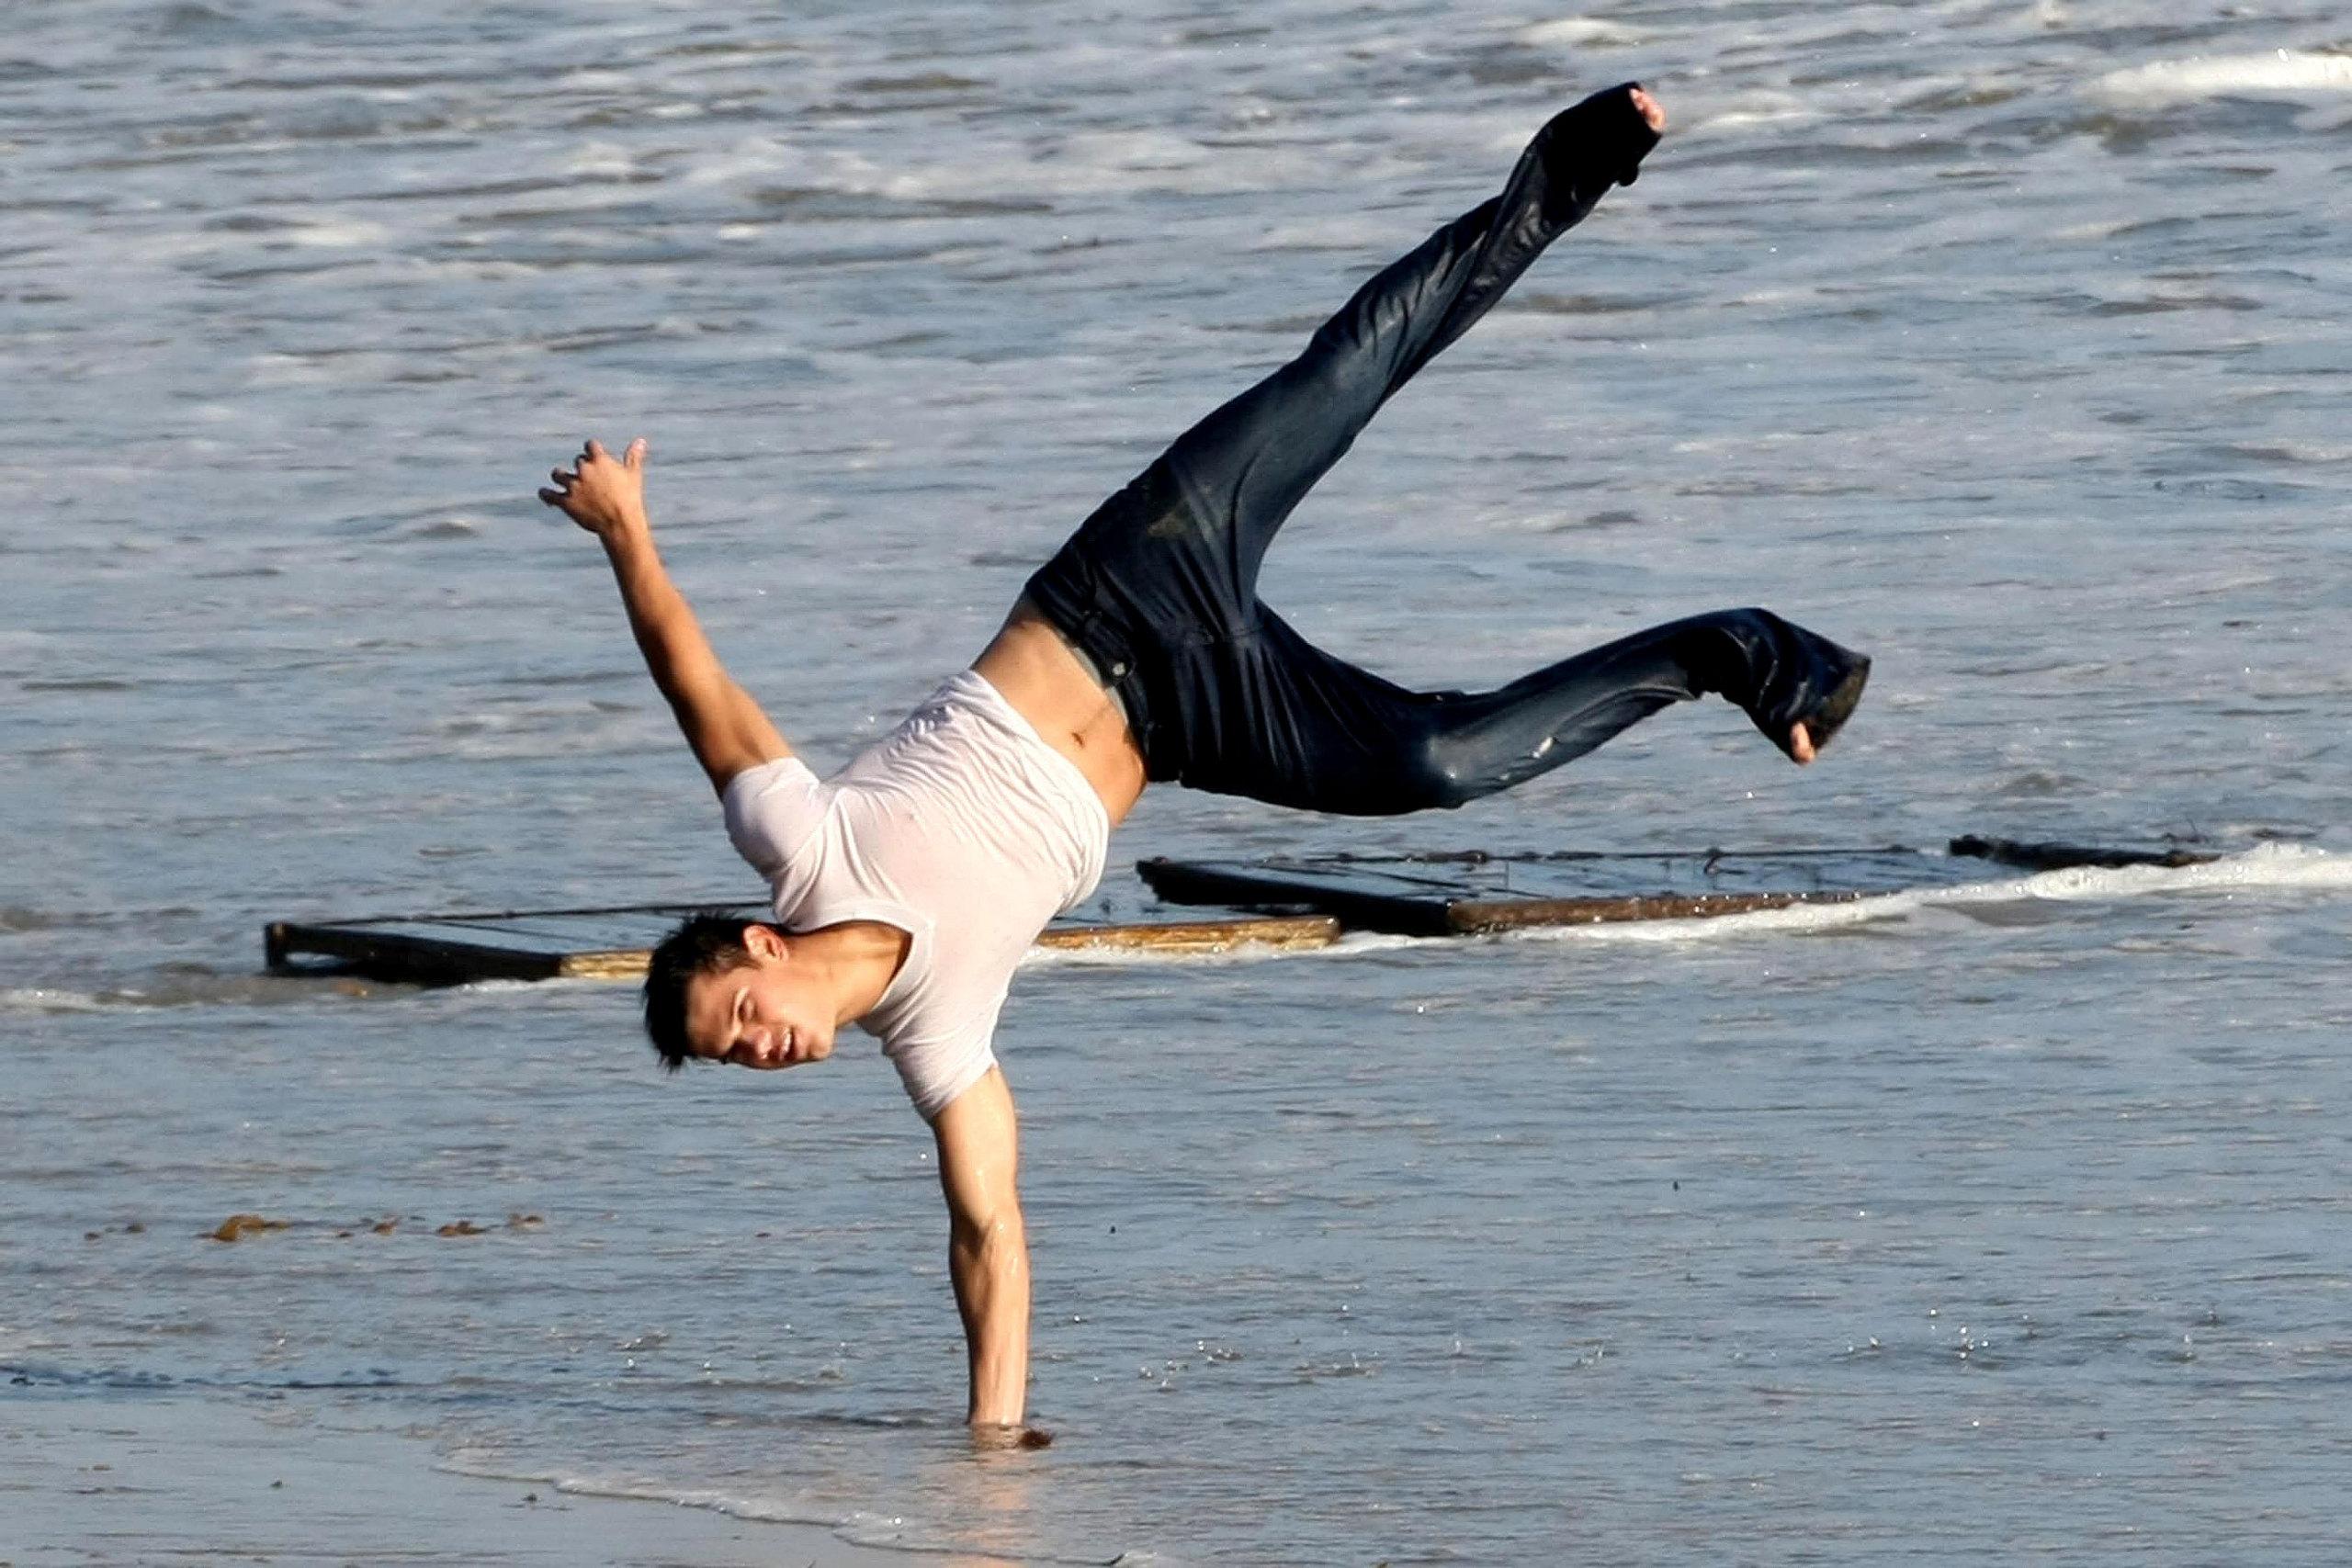 Taylor Lautner flips for Rolling Stones